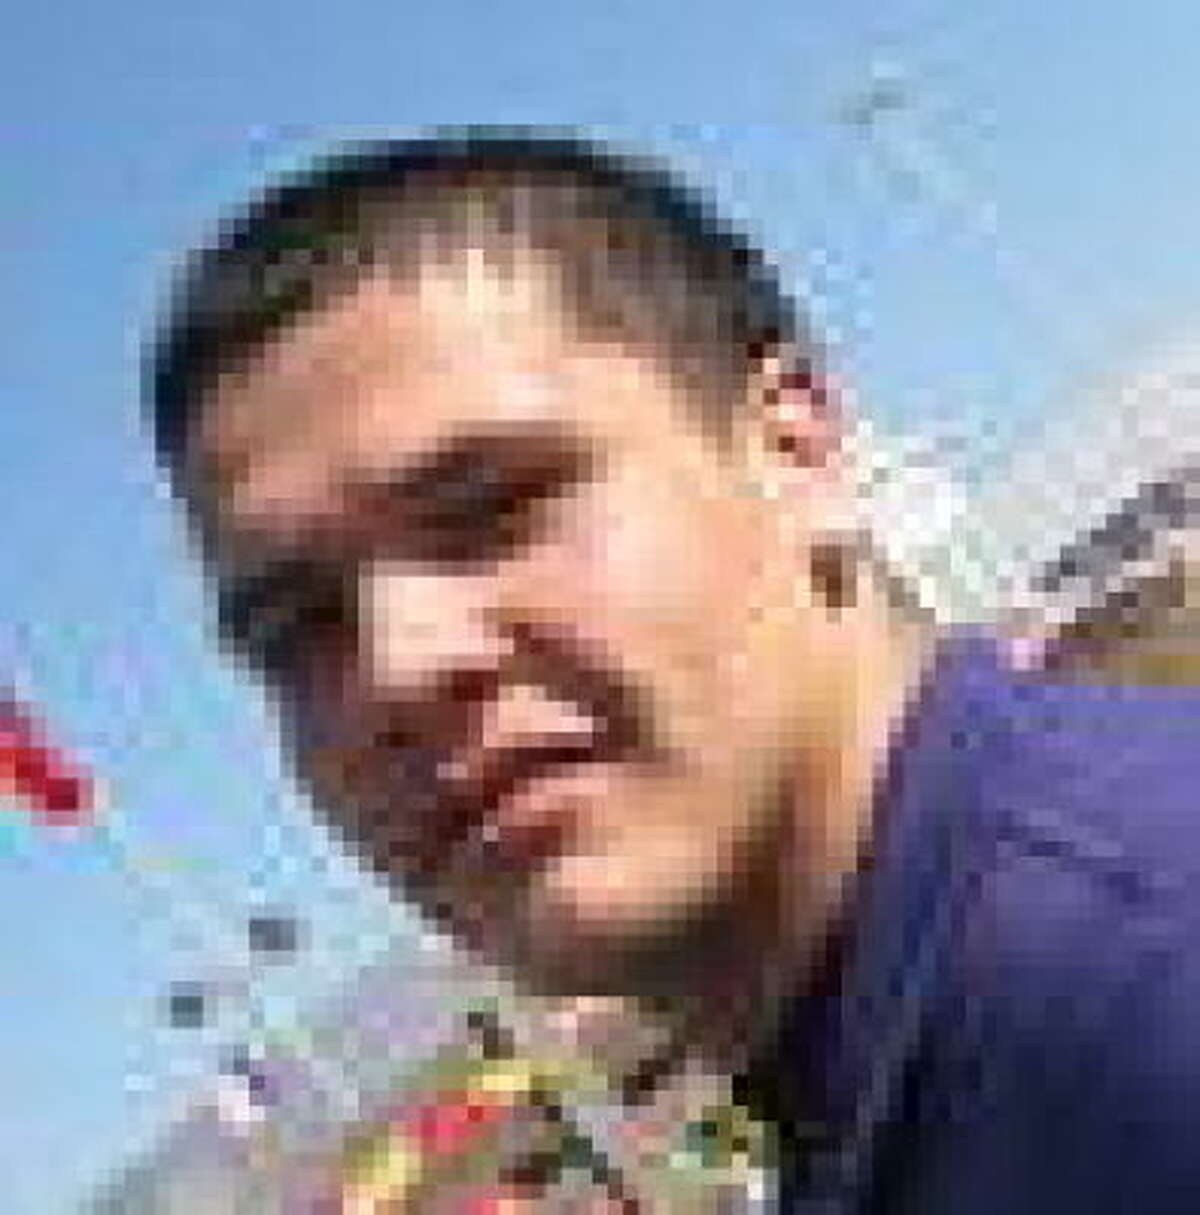 Joshua Guajardo, a Morton Ranch High School graduate, was murdered May 21.